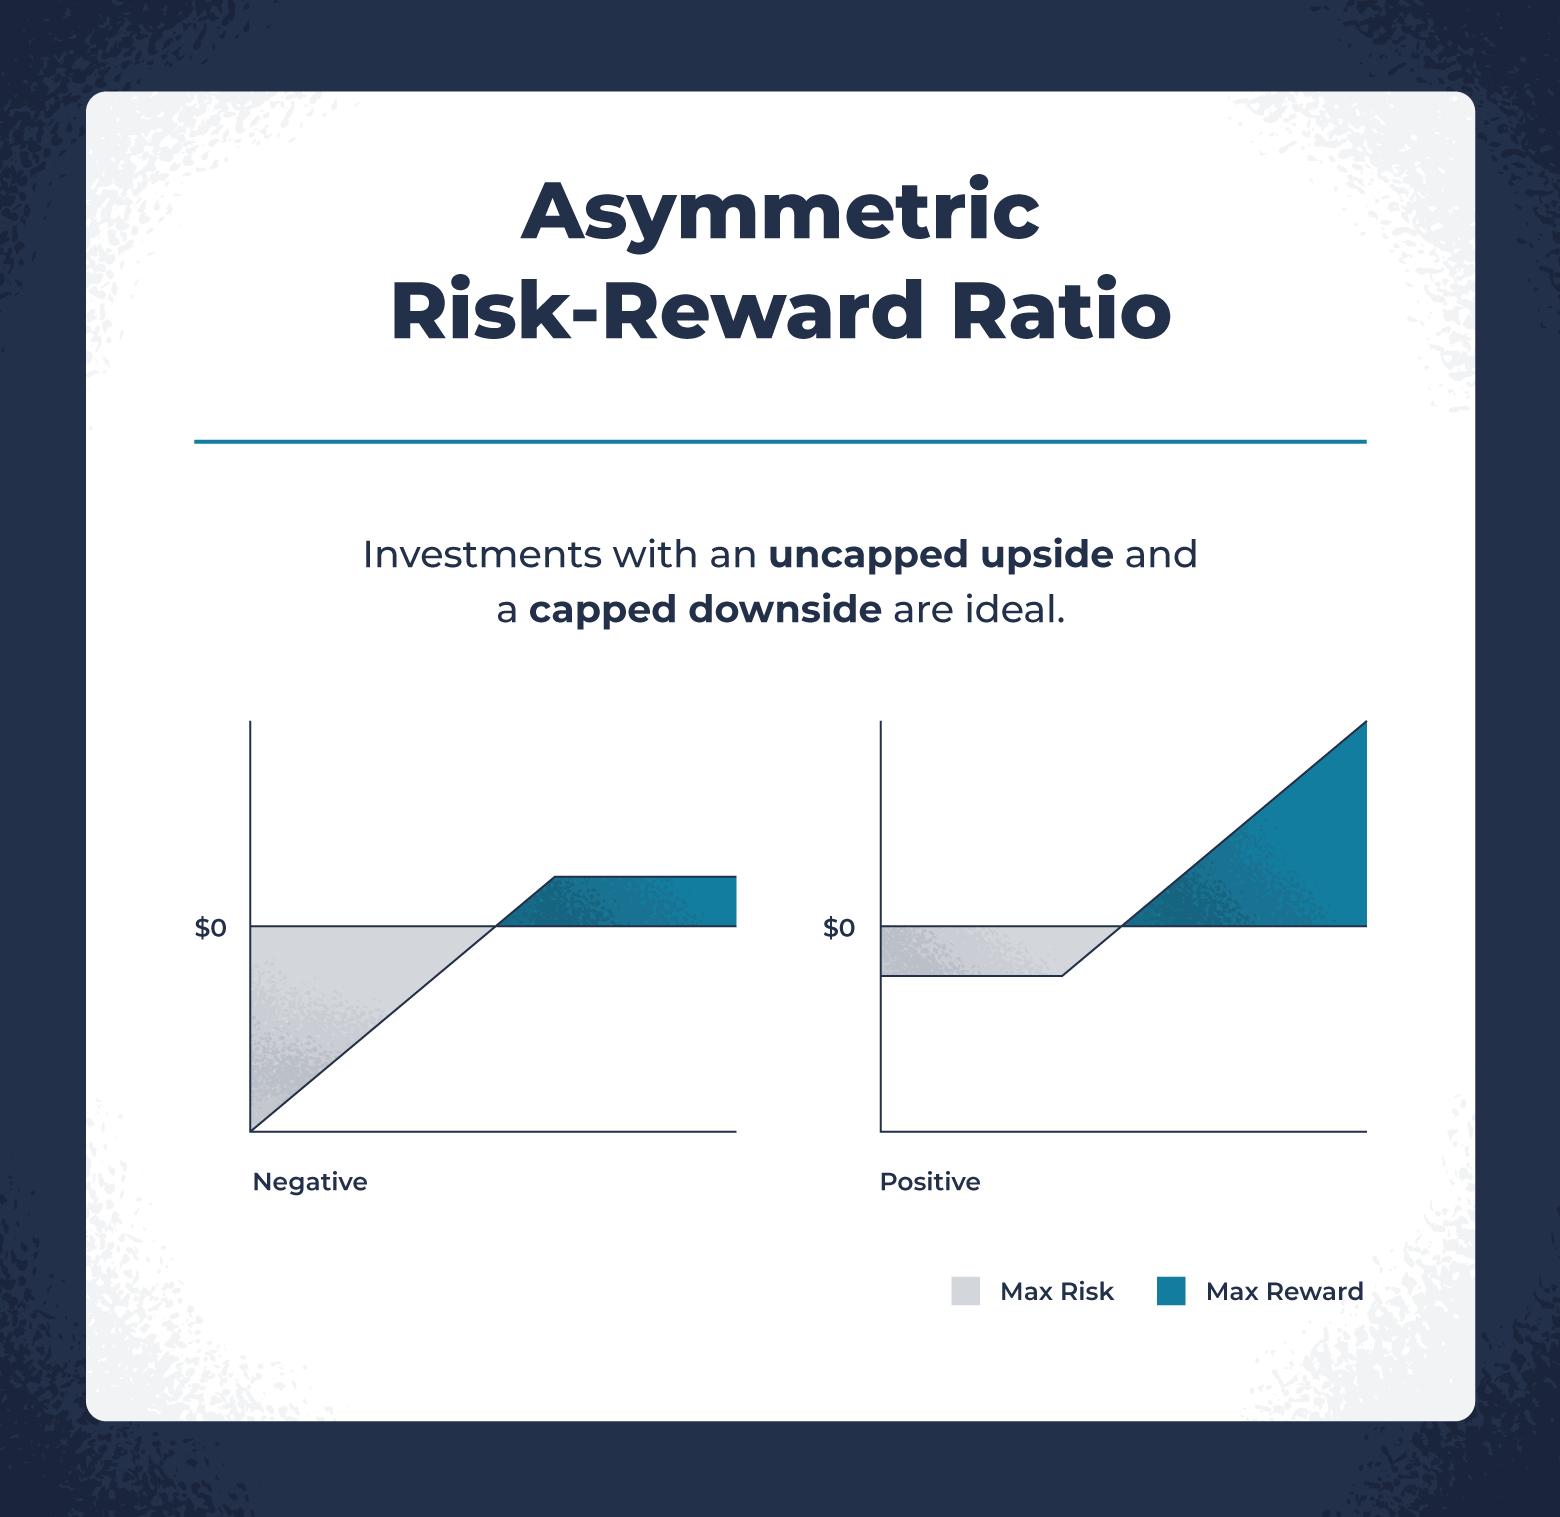 asymmetric risk-reward ratio for high-risk investment analysis